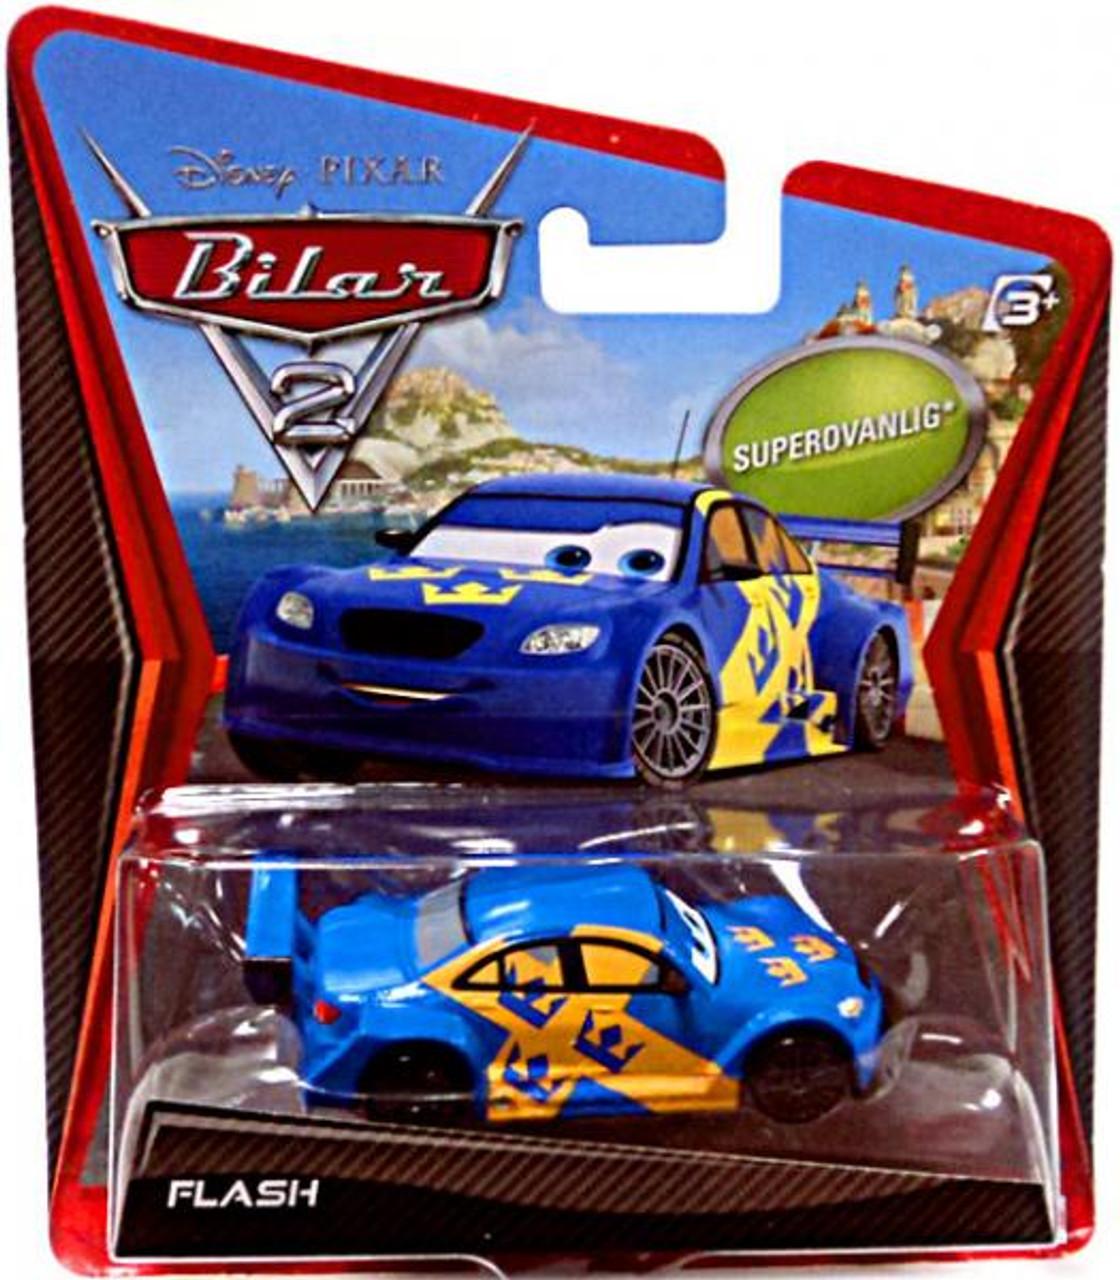 Disney Cars Cars 2 Main Series Flash Diecast Car [Sweden]